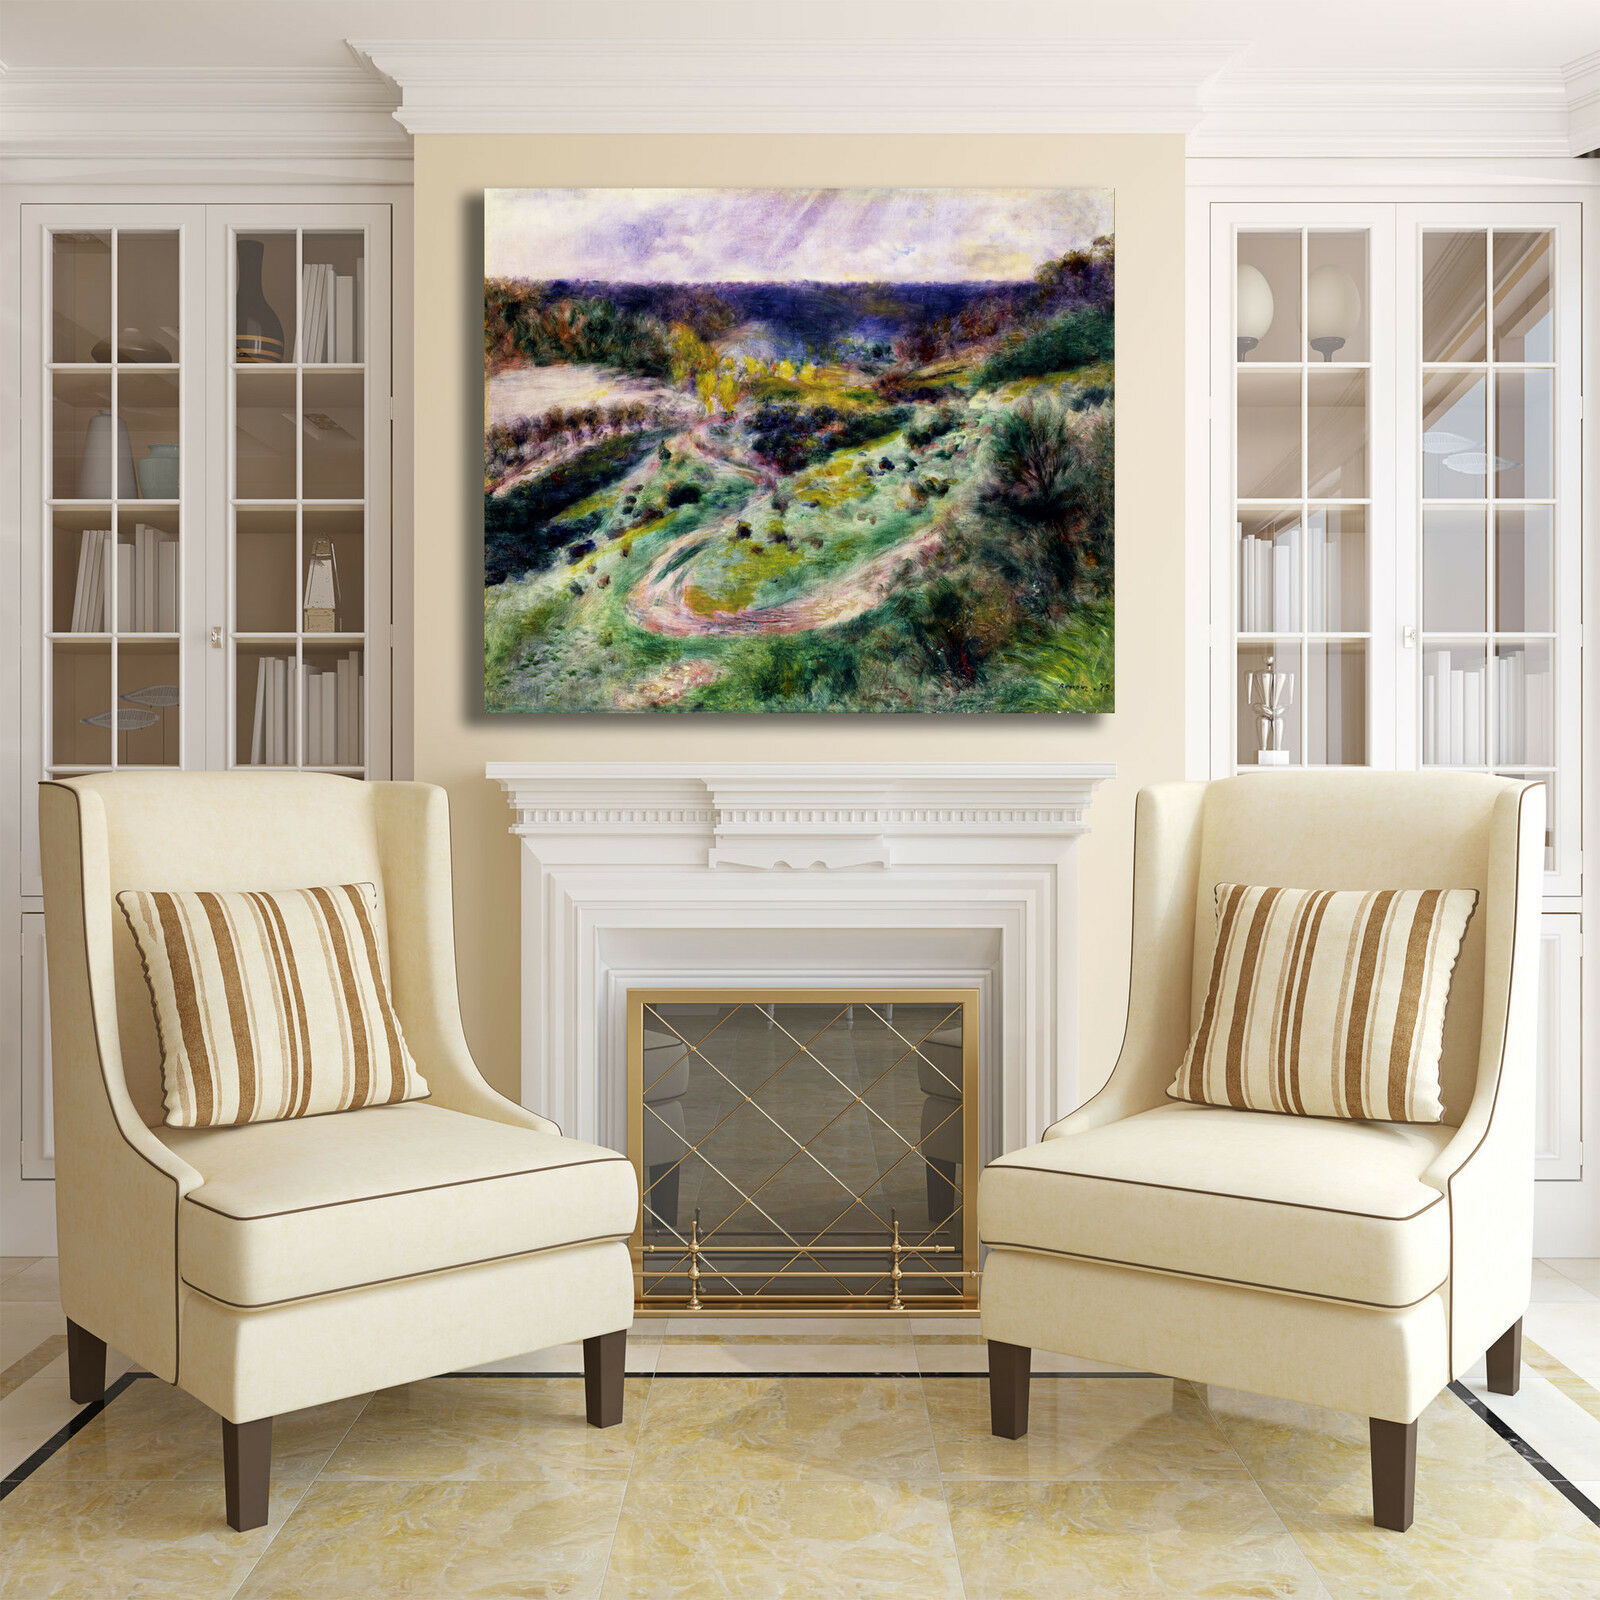 Reschwarz strada a Wargemont design quadro quadro quadro stampa tela dipinto telaio arroto casa 25d106